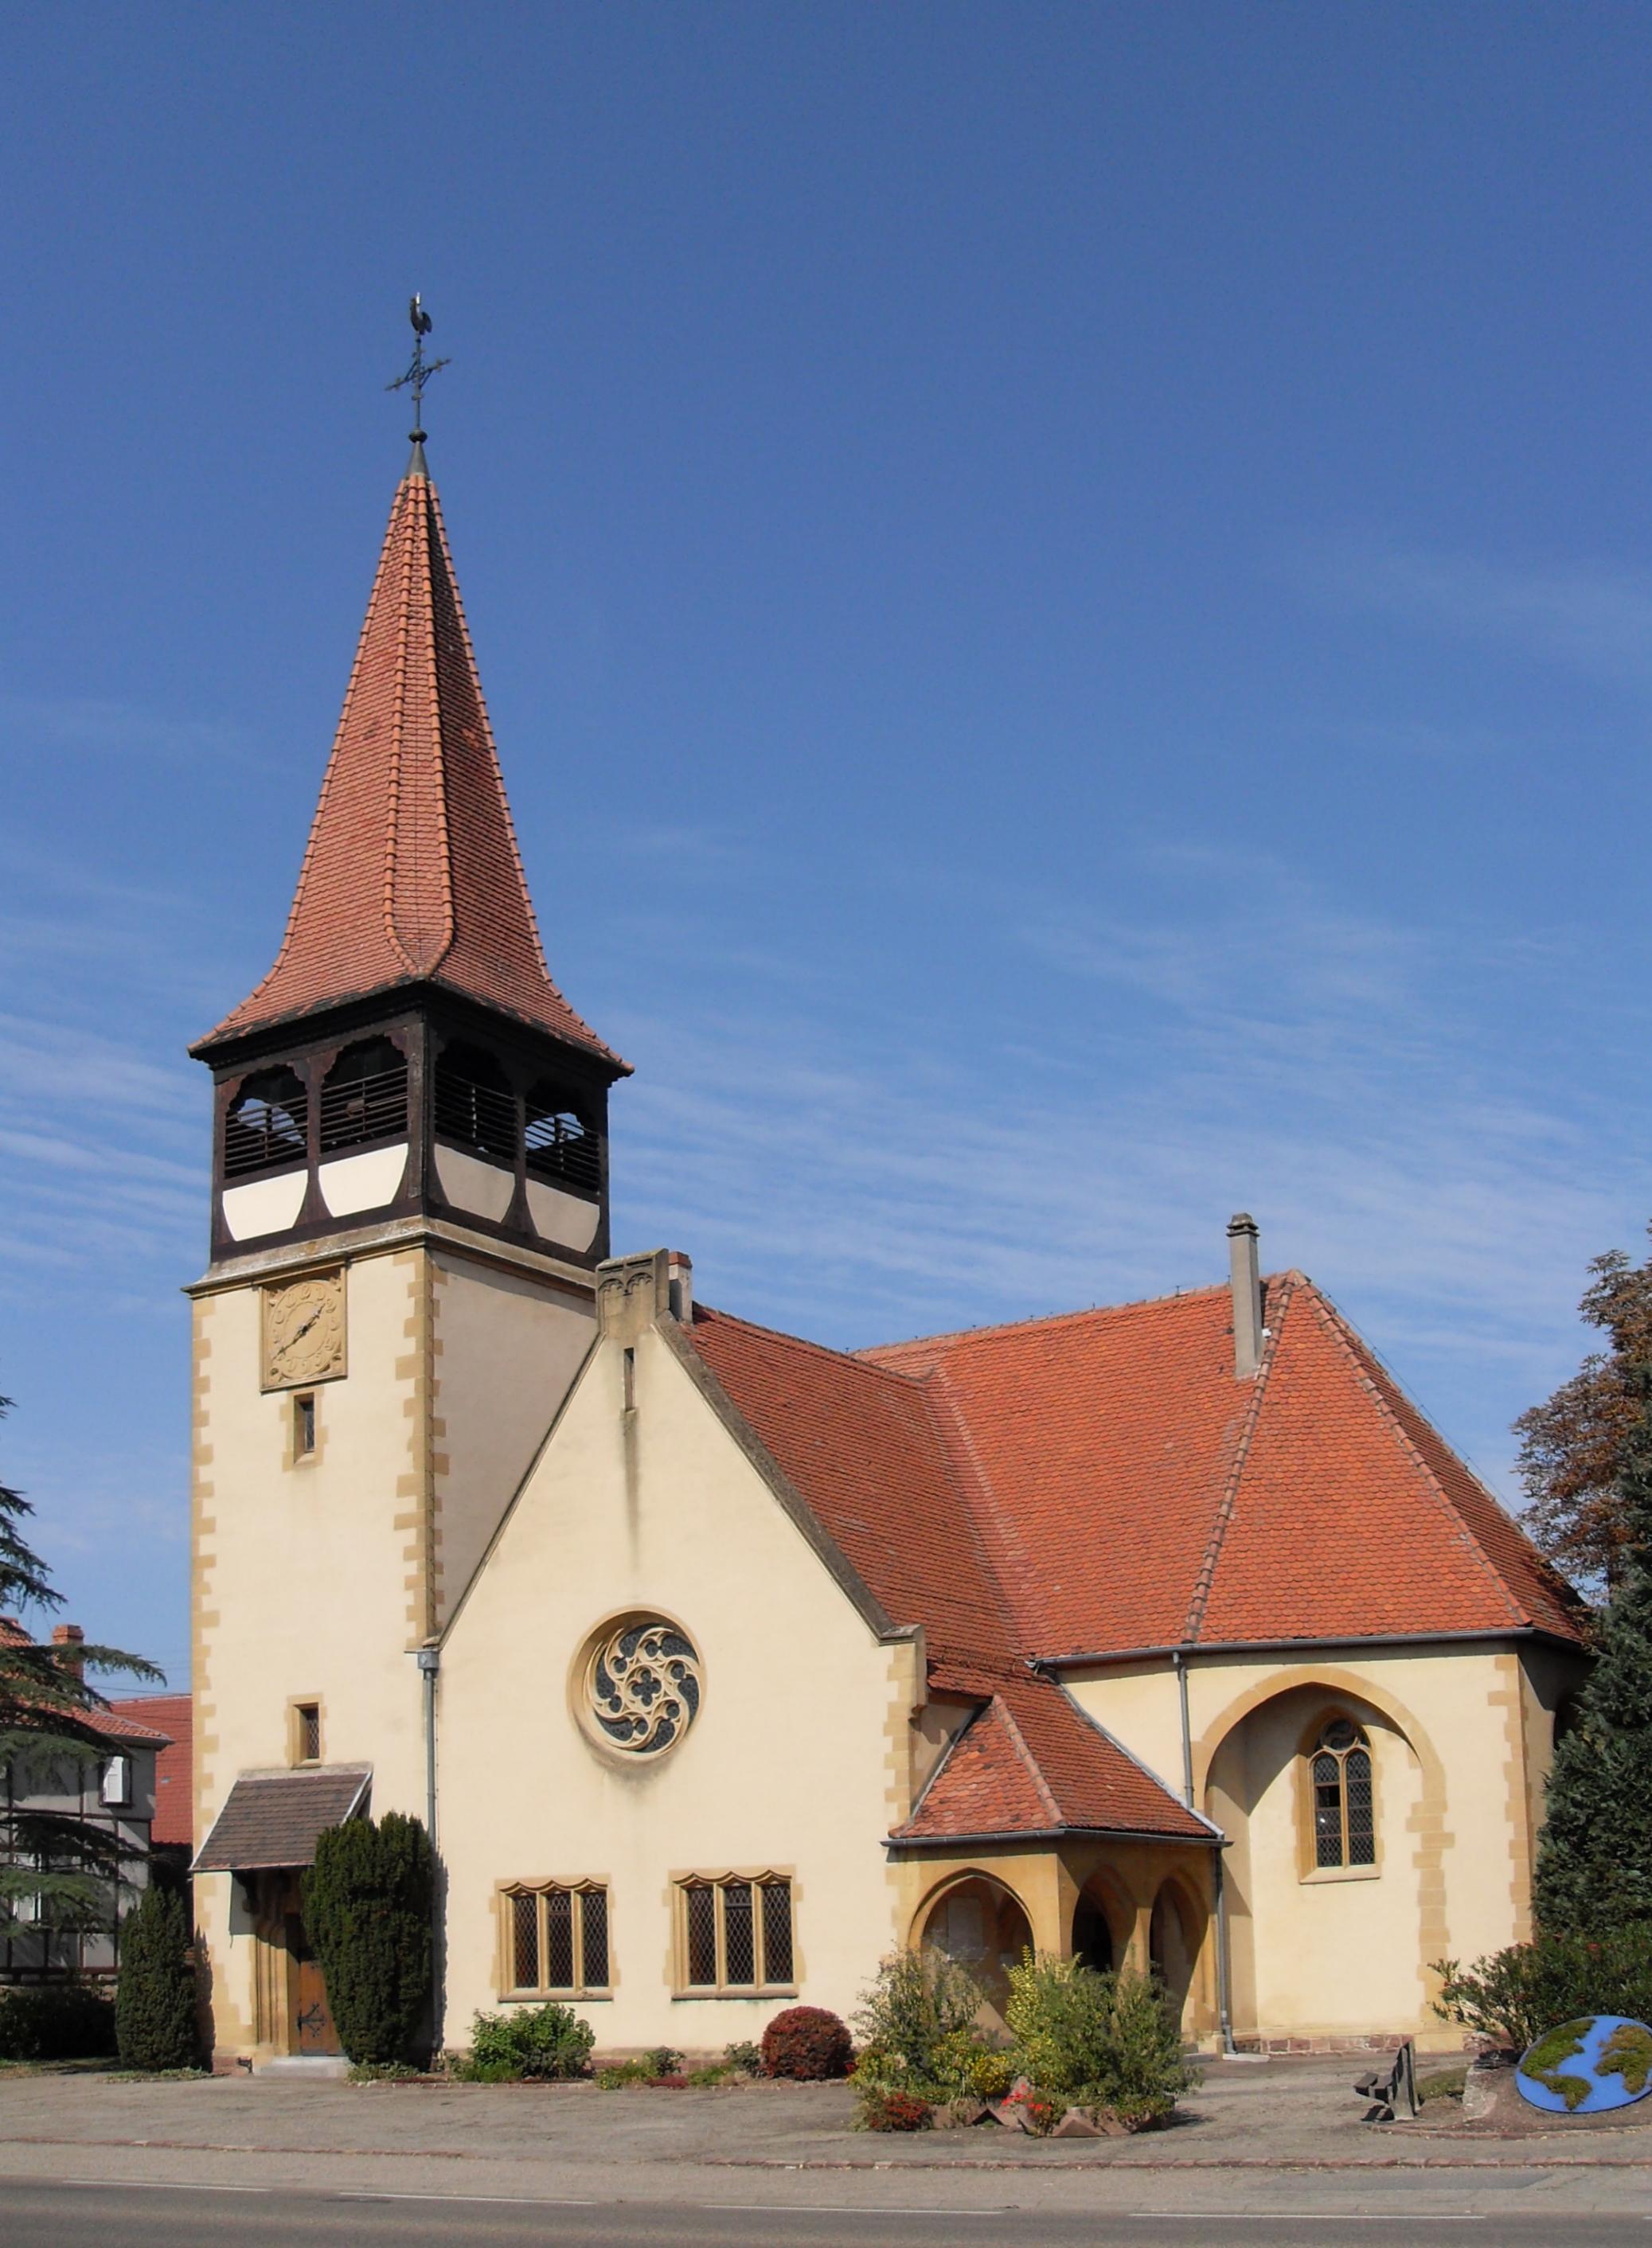 File:Horbourg, Eglise protestante.jpg - Wikimedia Commons